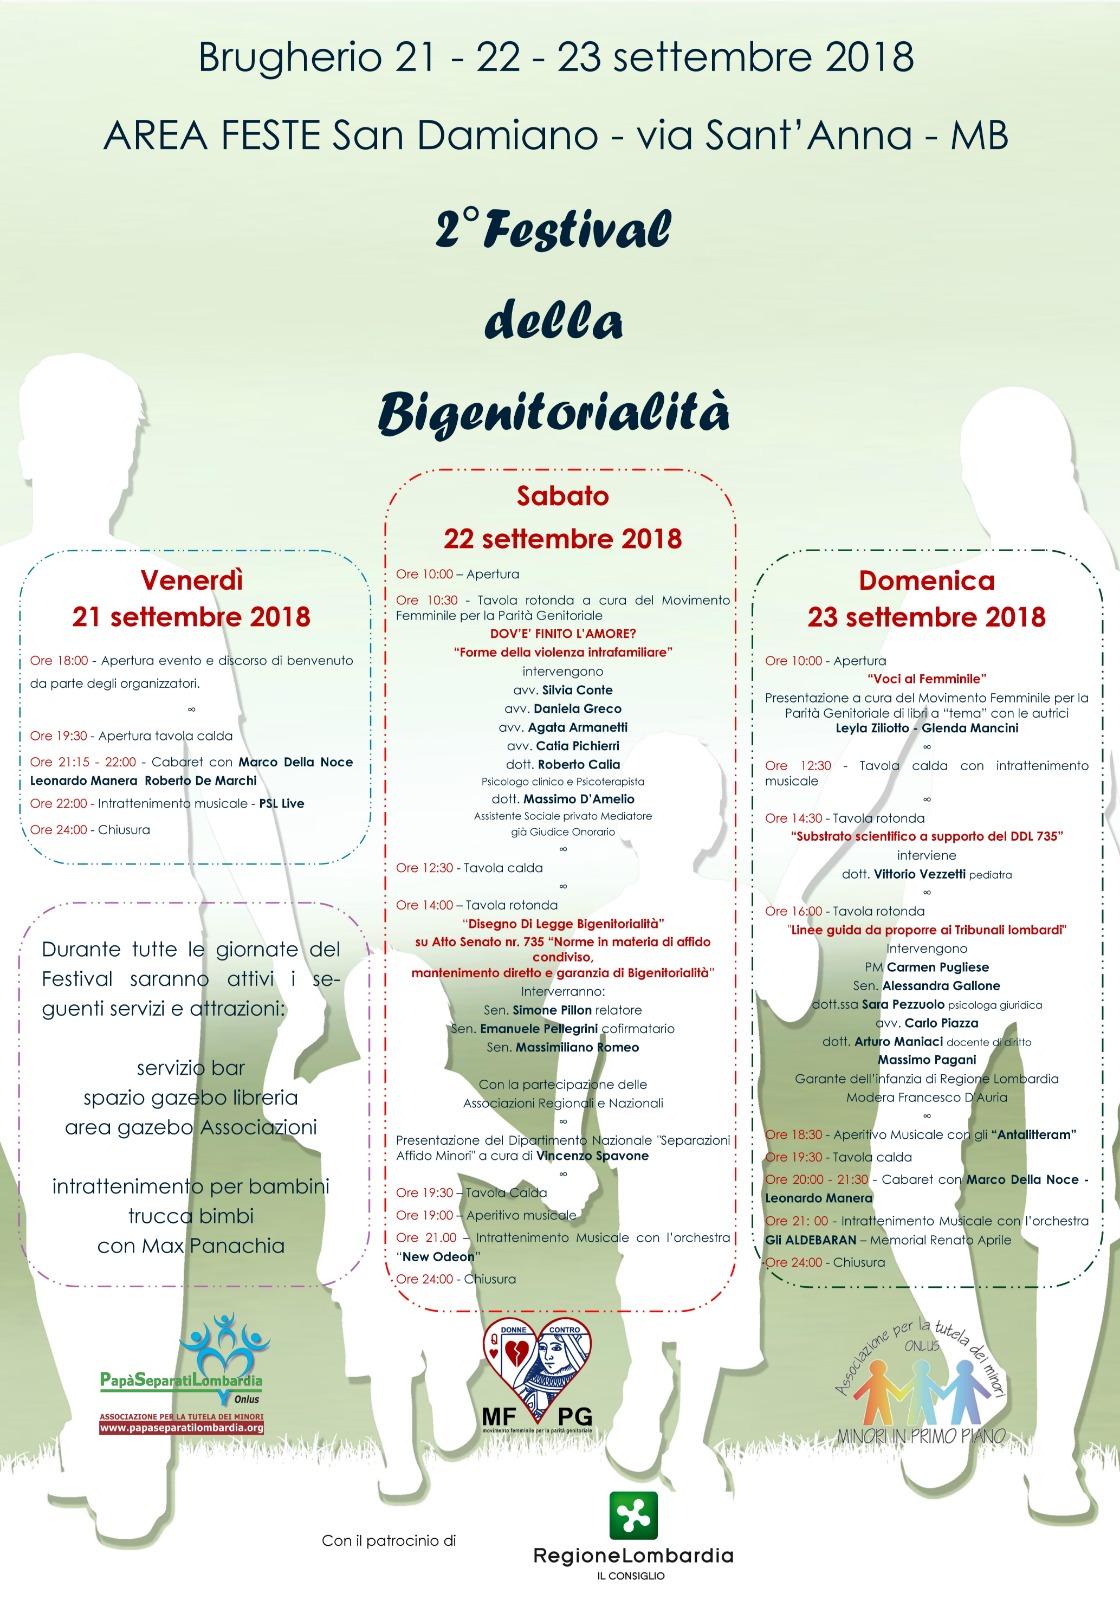 Esempio Calendario Affidamento Condiviso.Papa Separati Lombardia Affido Condiviso Dei Minori